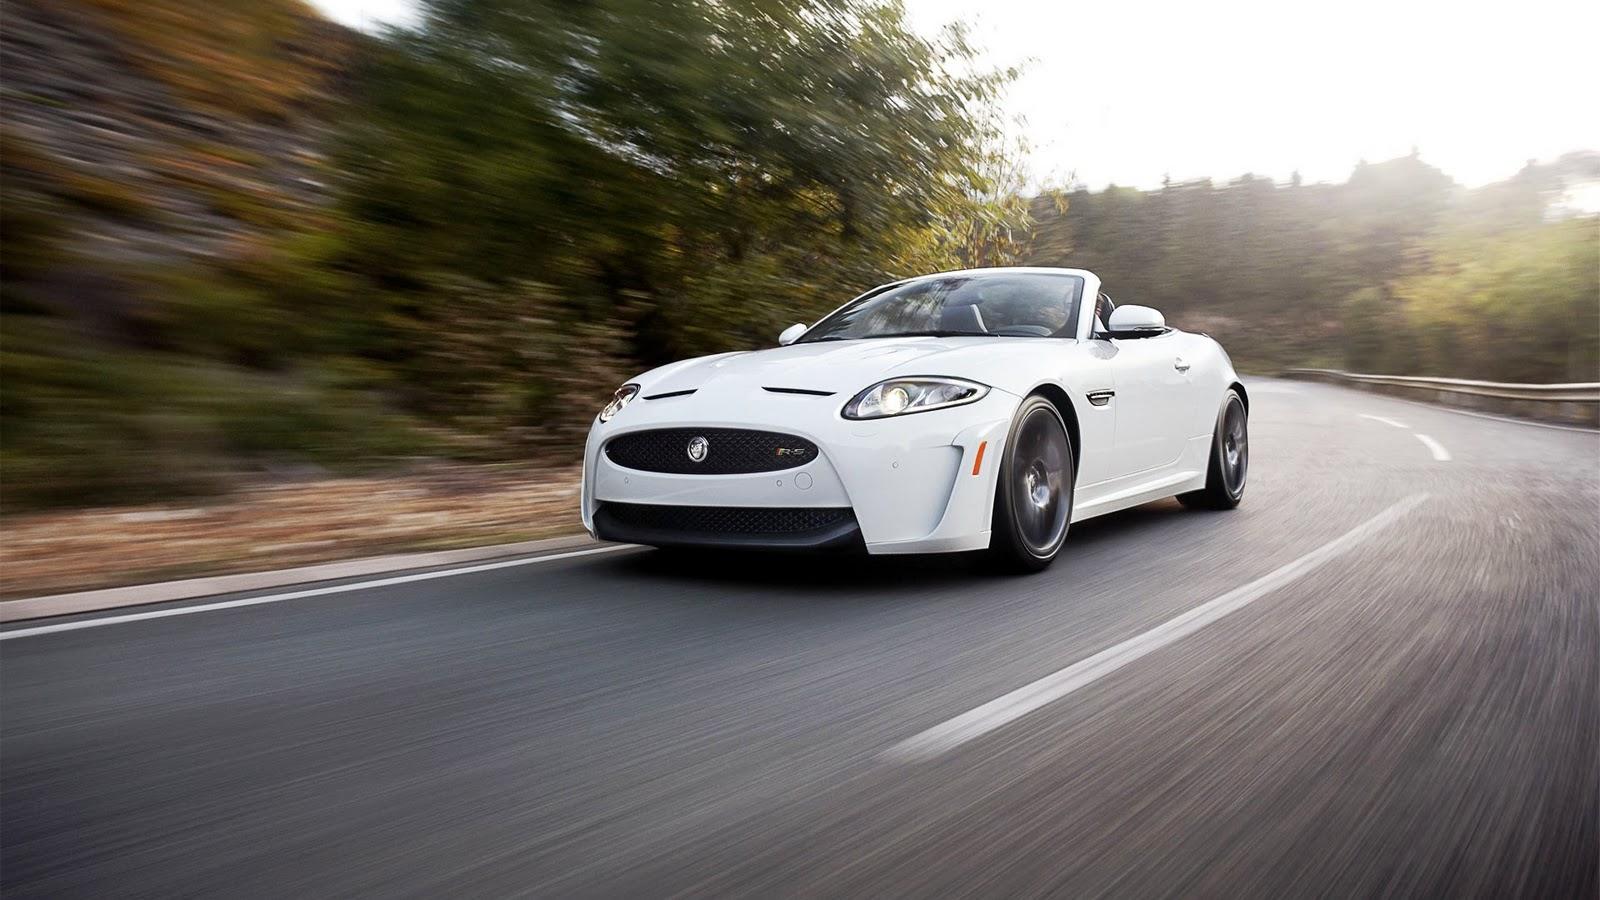 http://1.bp.blogspot.com/-uiVkEYIZ5Vc/TsjXzqIB4WI/AAAAAAAAAd0/ZPJrIweBgKg/s1600/2013+Jaguar+C-X16+10.jpg